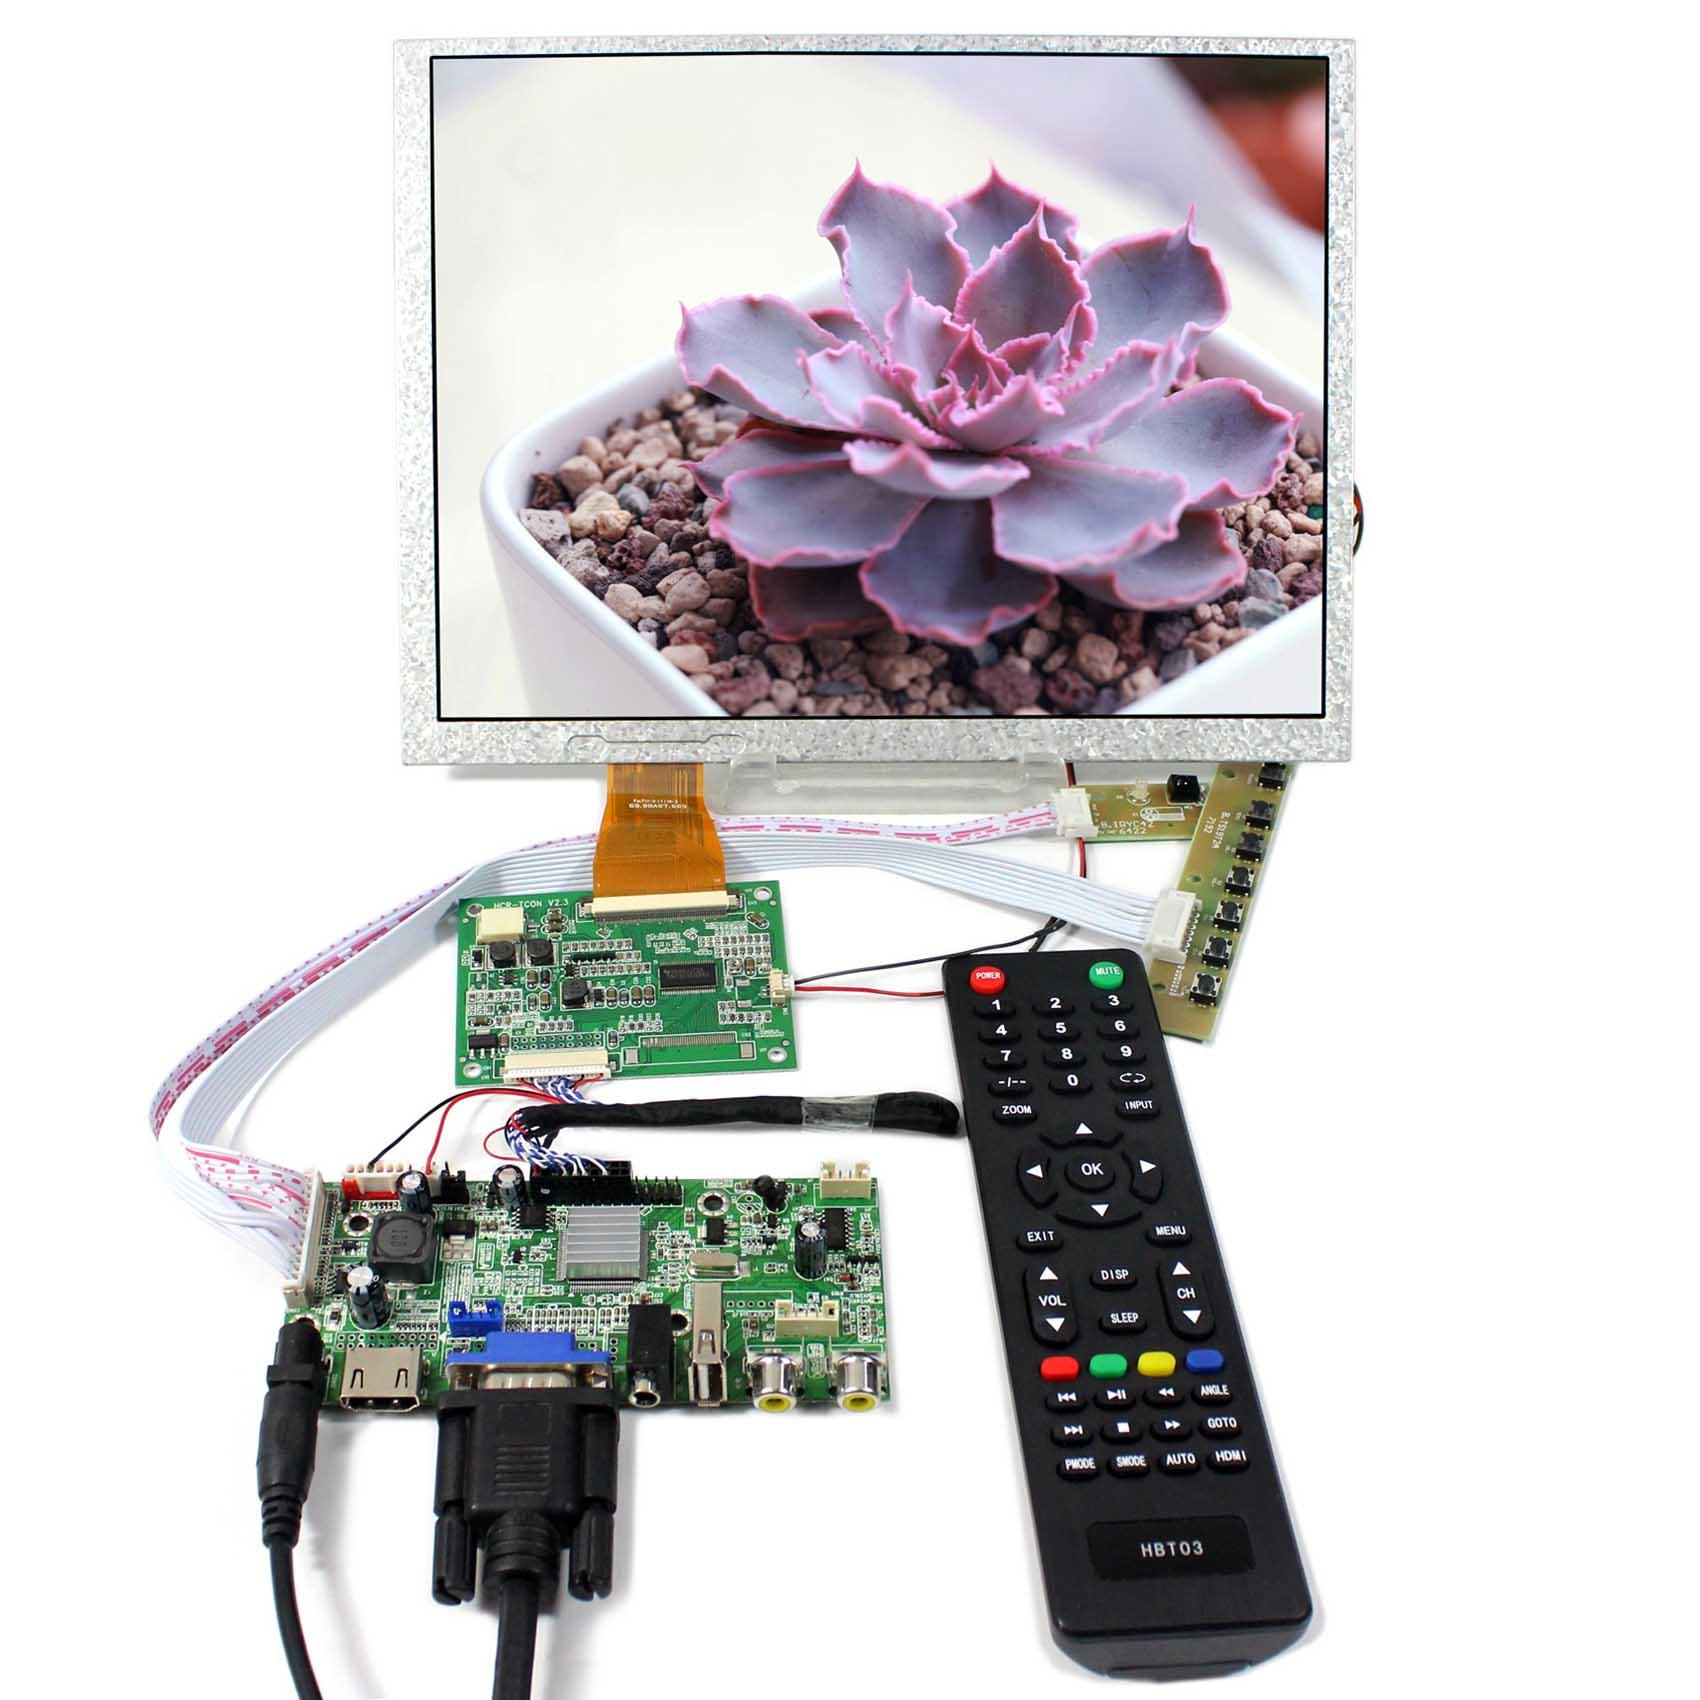 HDMI+VGA+AV+Audio+USB LCD Controller board With 10.4inch 800X600 A104SN03-V1 LCD ScreenHDMI+VGA+AV+Audio+USB LCD Controller board With 10.4inch 800X600 A104SN03-V1 LCD Screen